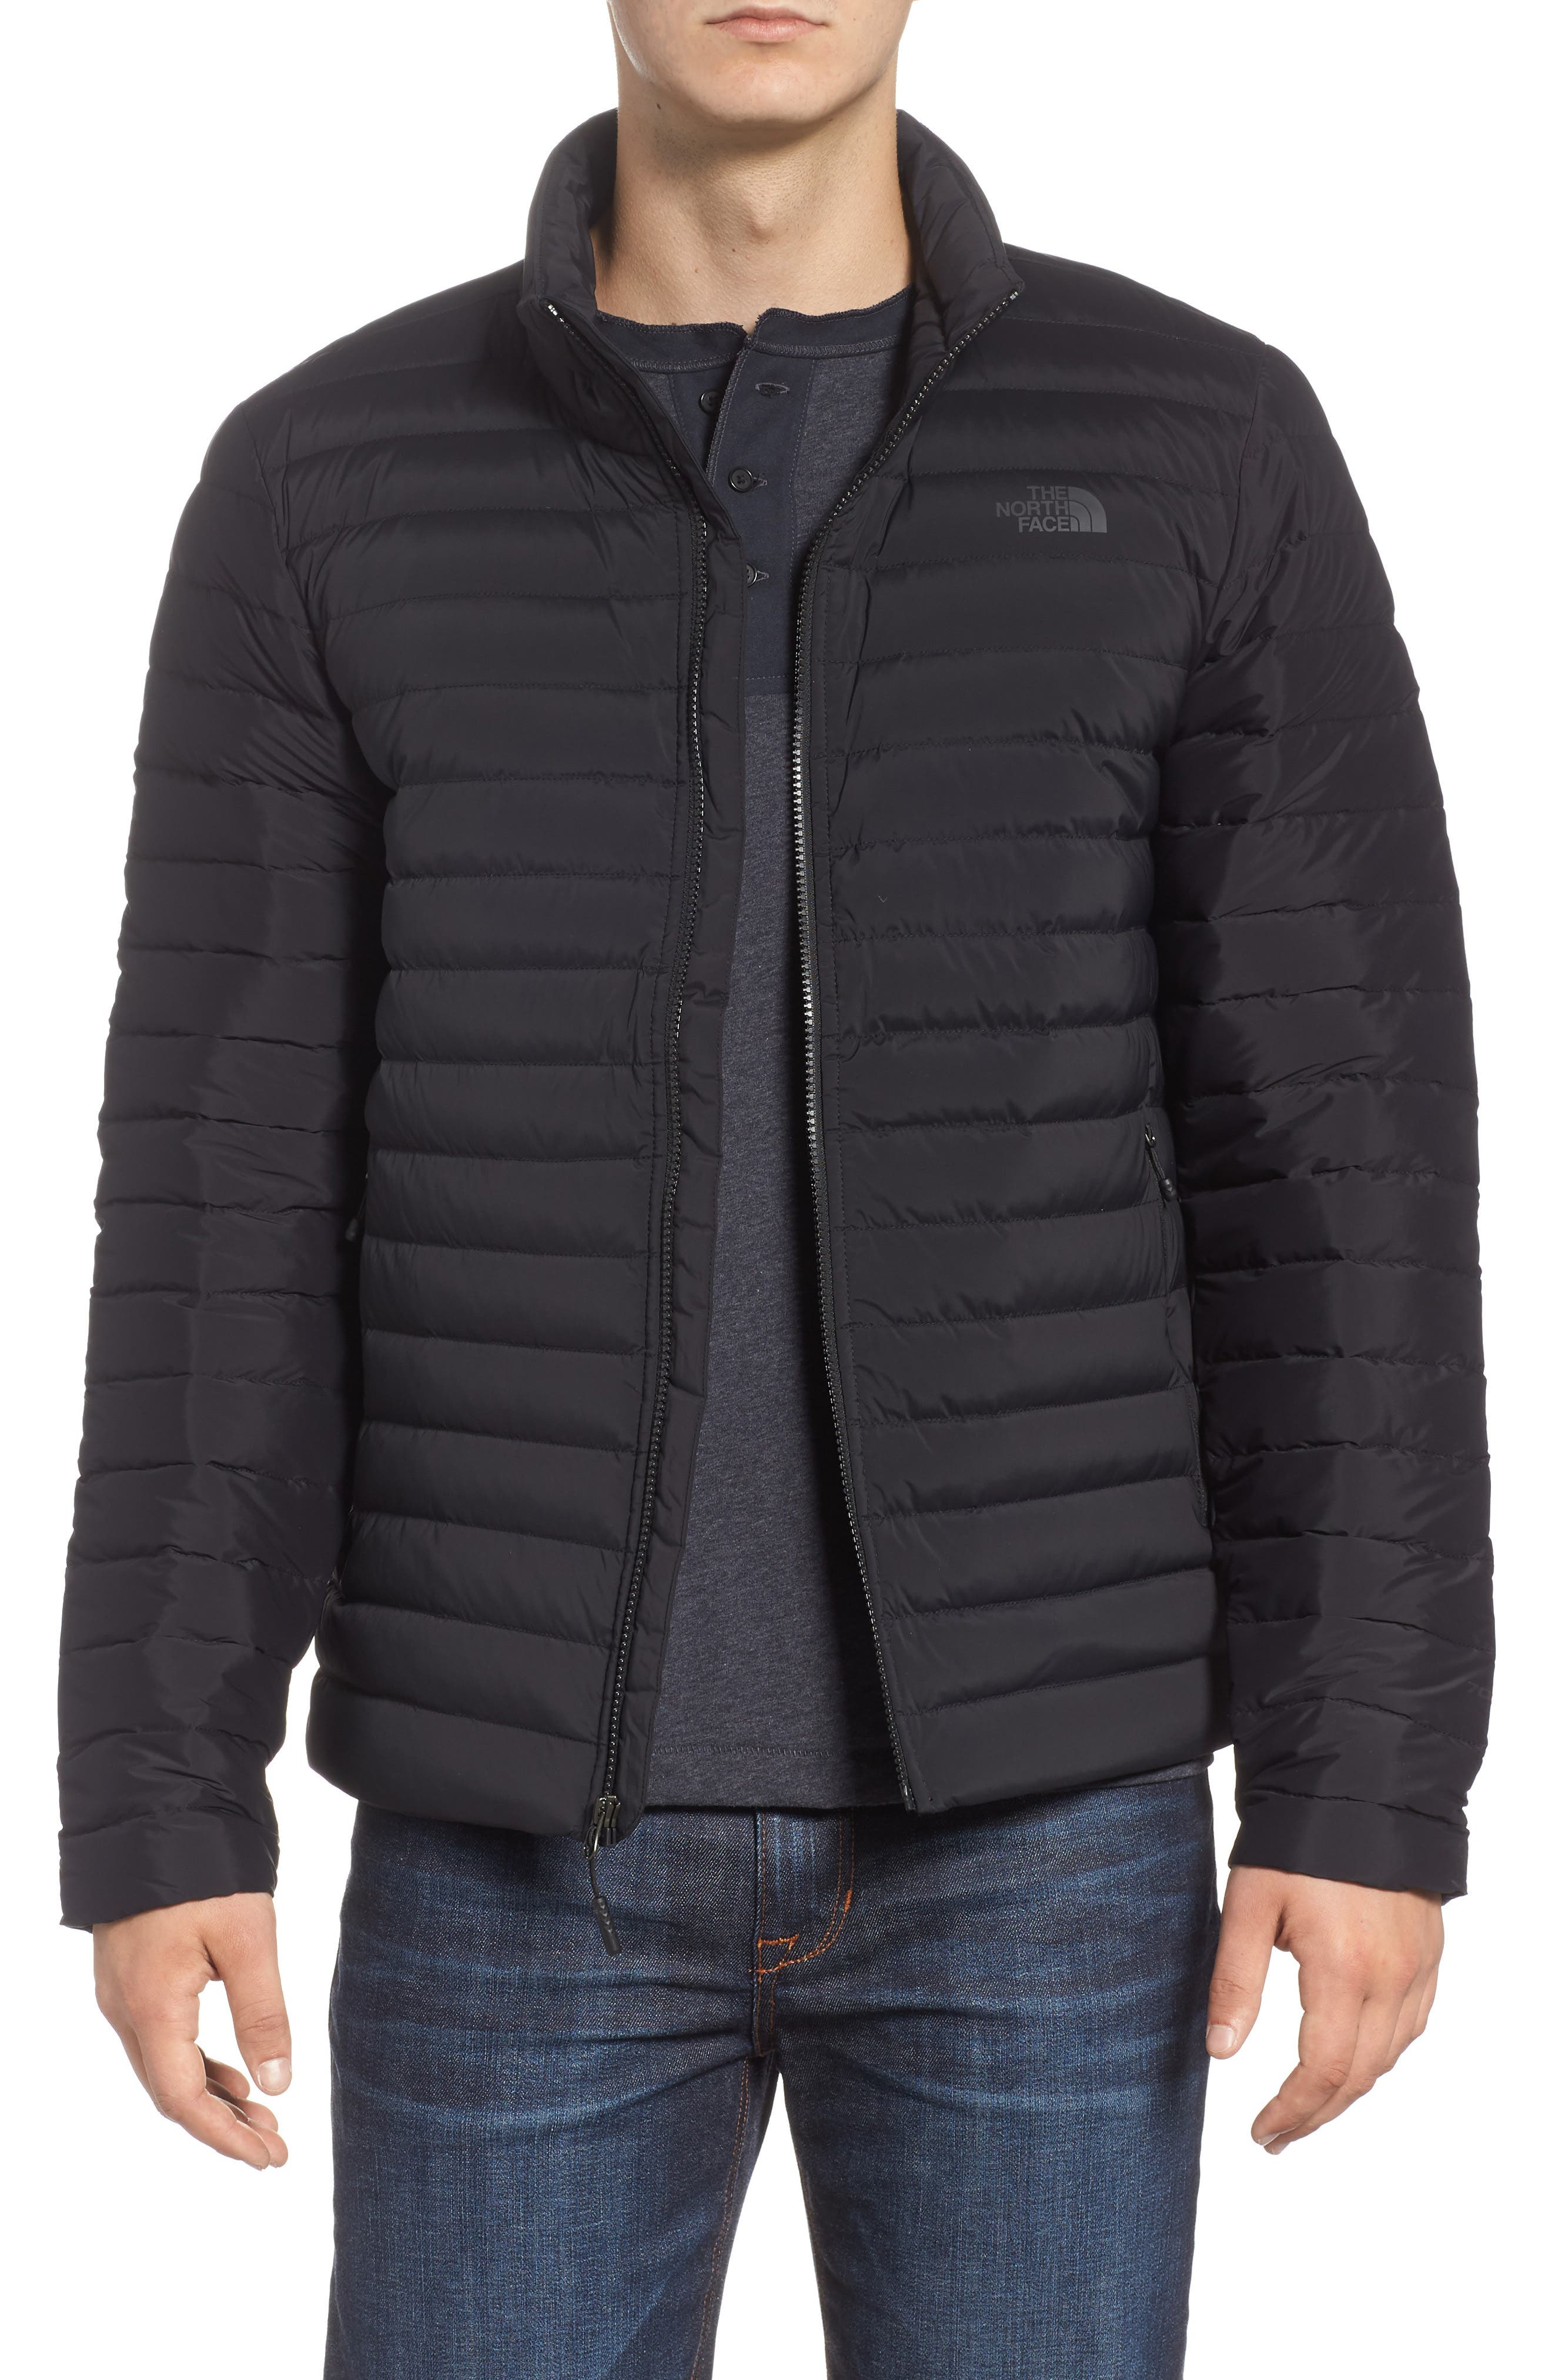 Packable Stretch Down Jacket,                         Main,                         color, TNF BLACK/ TNF BLACK